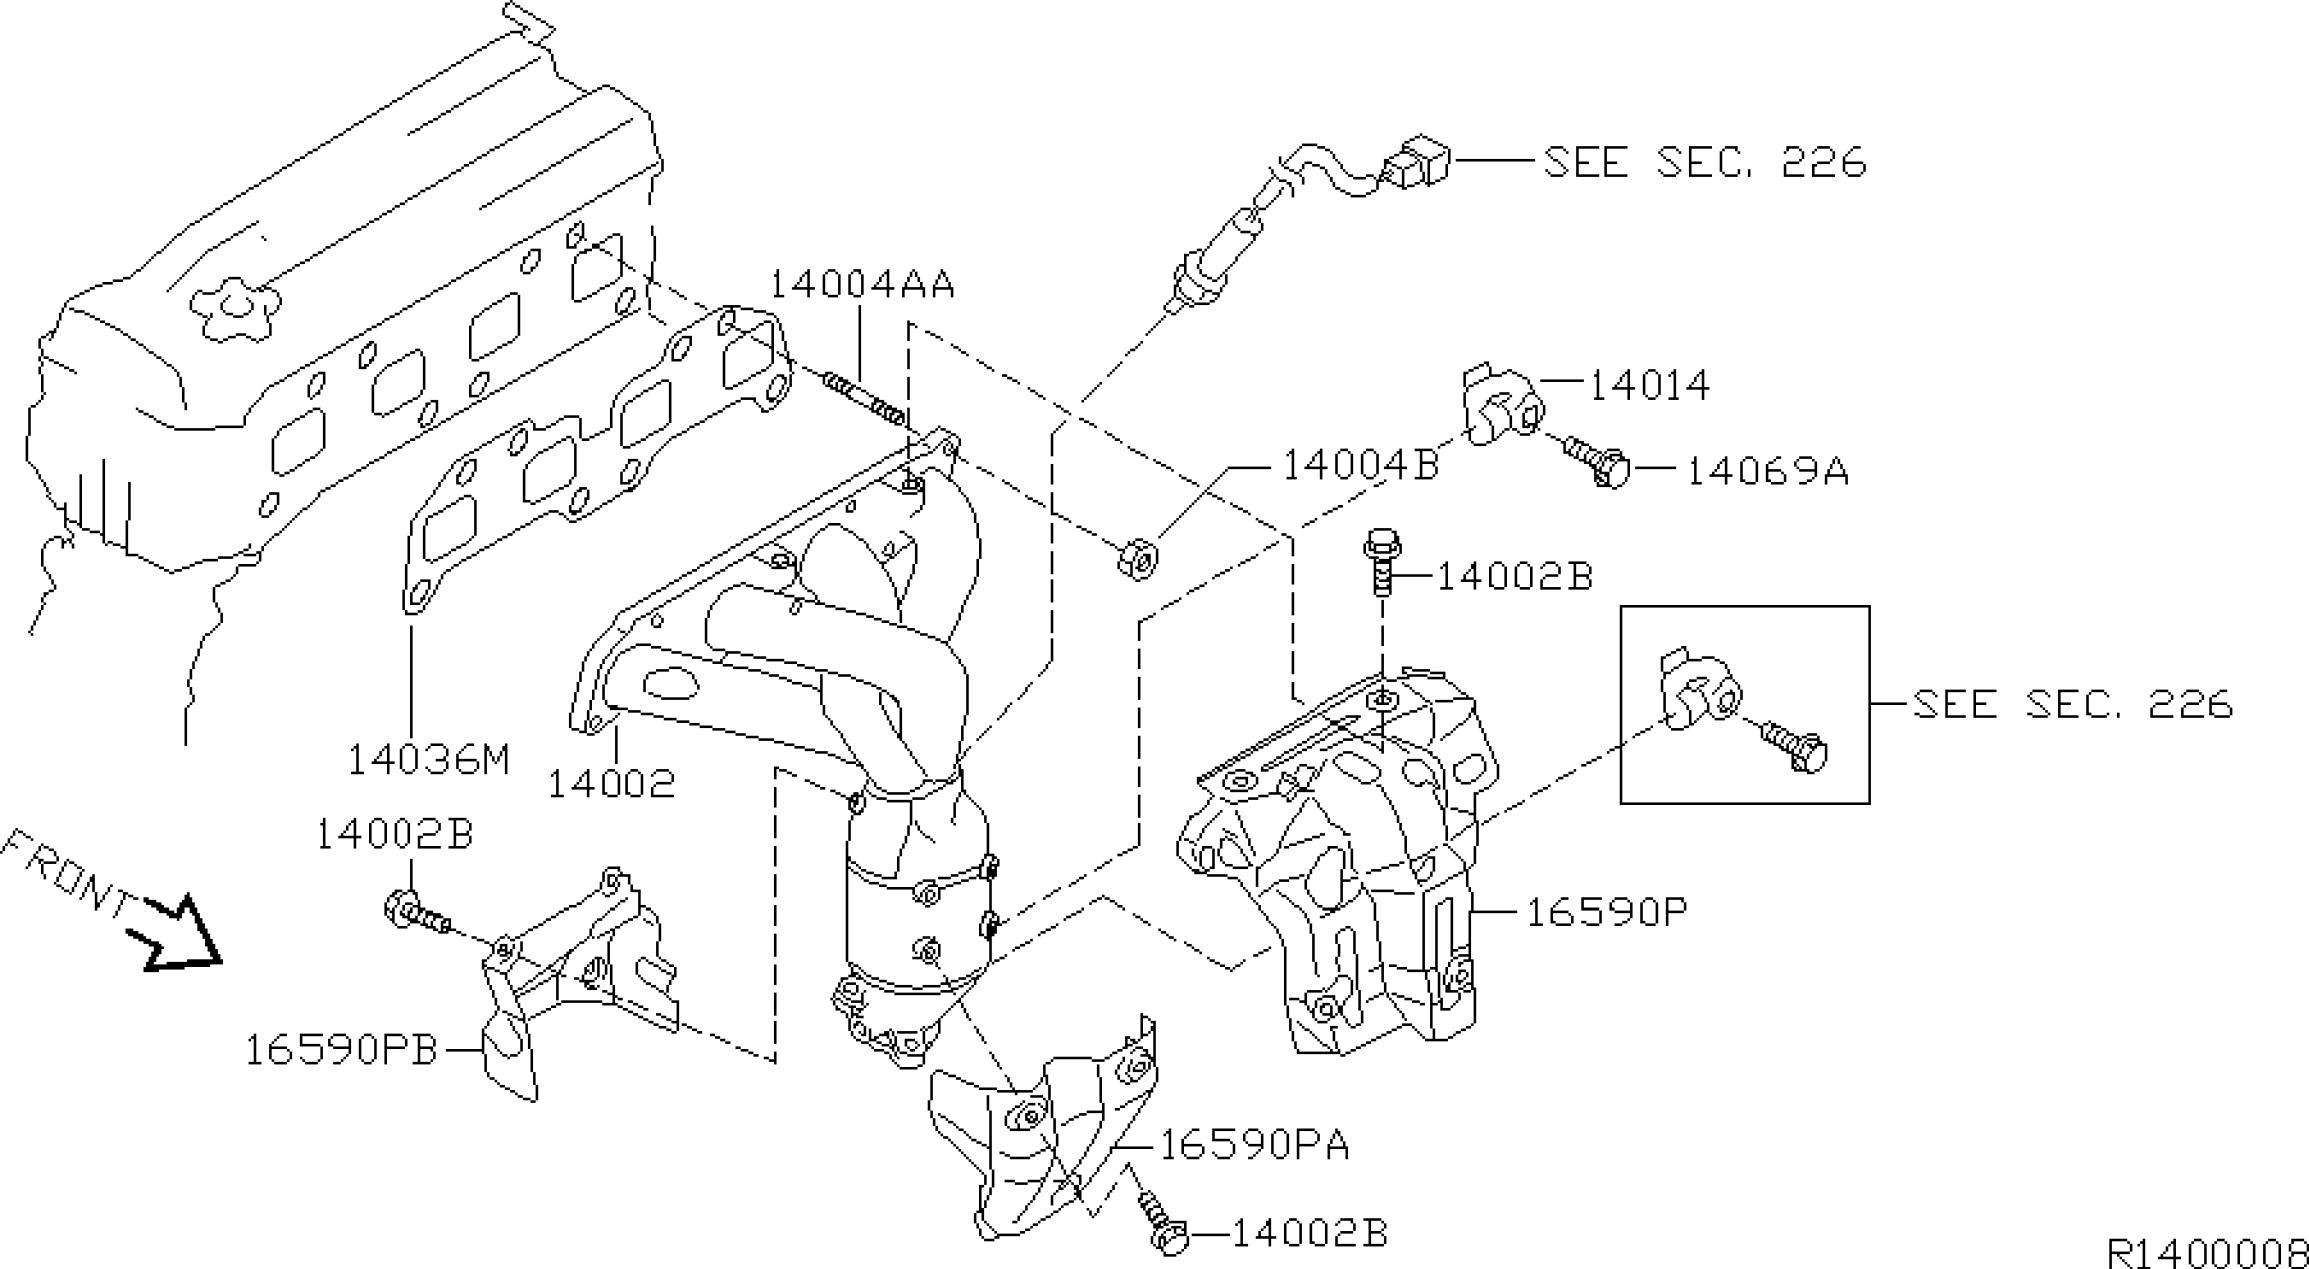 2016 nissan altima wiring diagram hot water boiler titan 2010 fuse box library